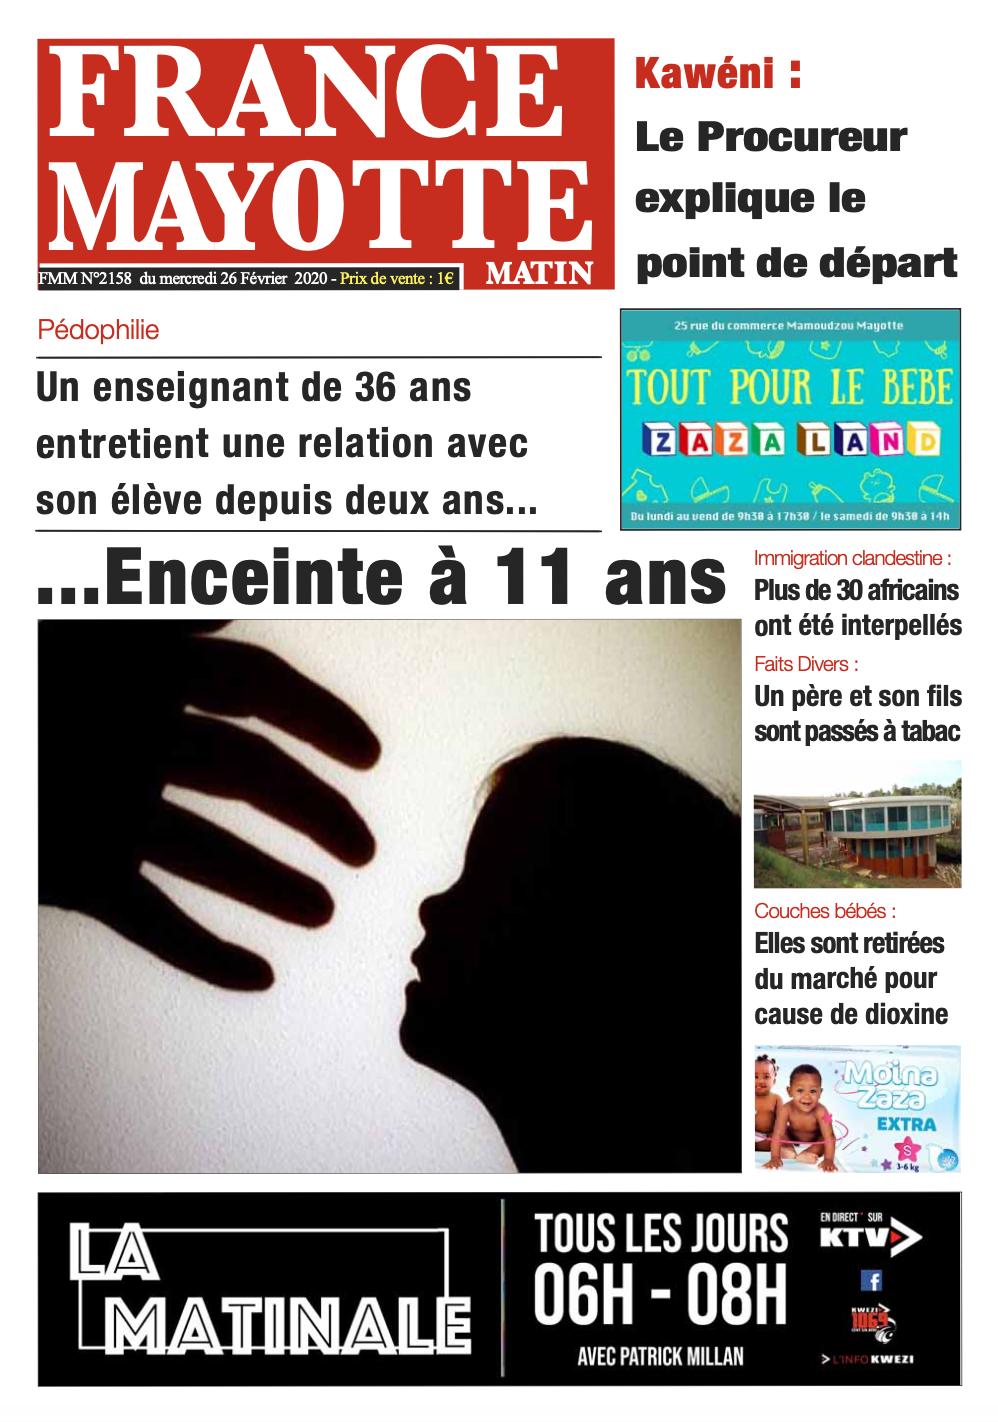 France Mayotte Mercredi 26 février 2020